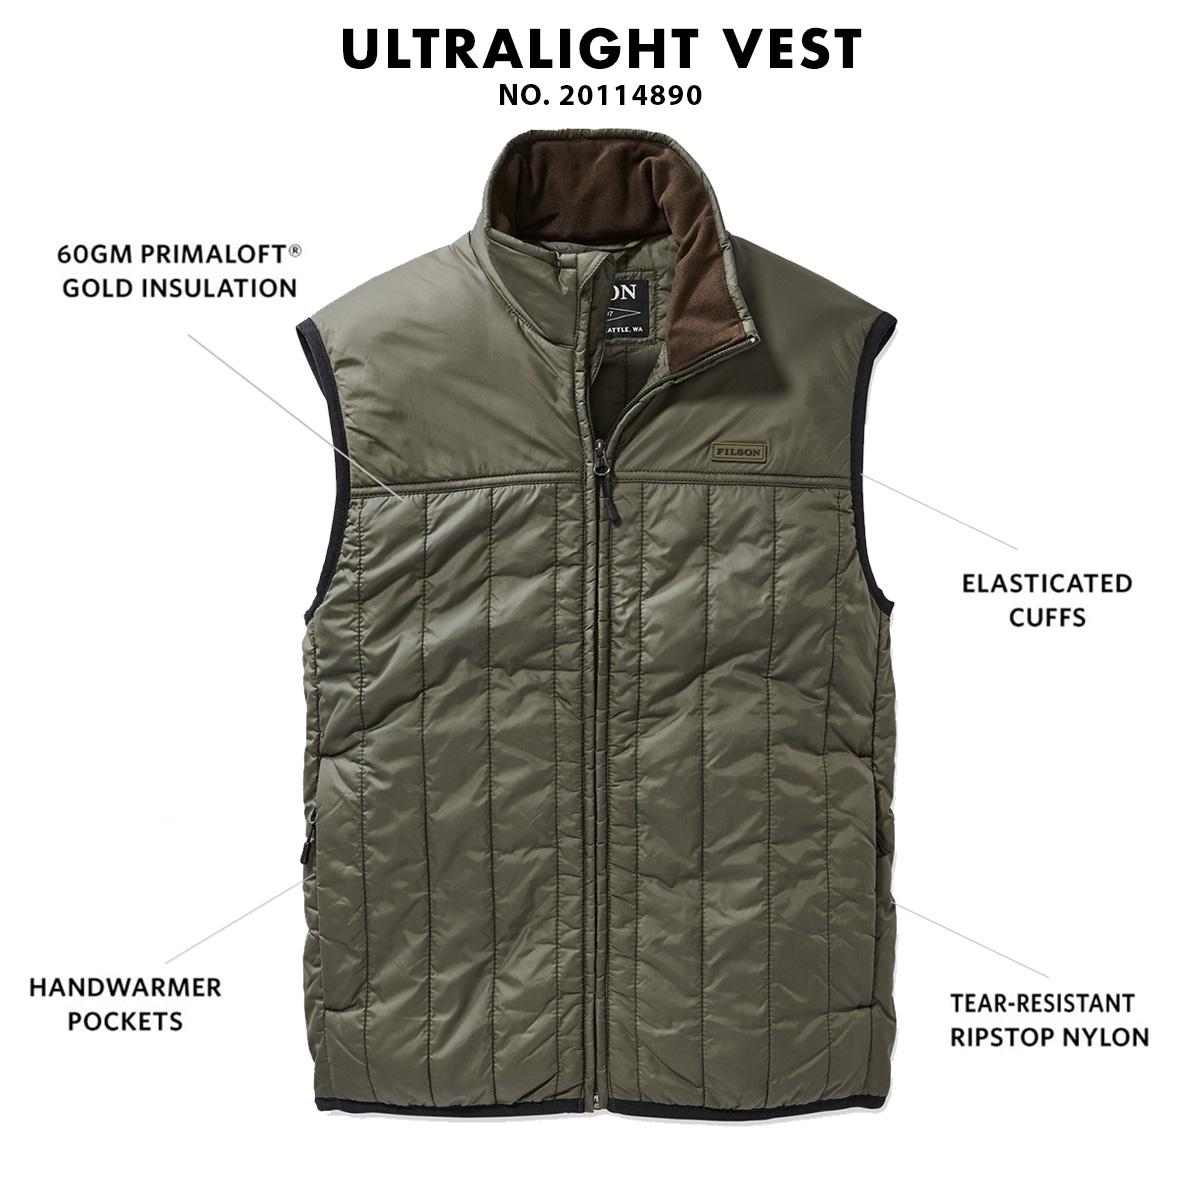 Filson Ultralight Vest Olive Gray, mit Cordura® Ripstop nylon und 60gm PrimaLoft® Gold insulation